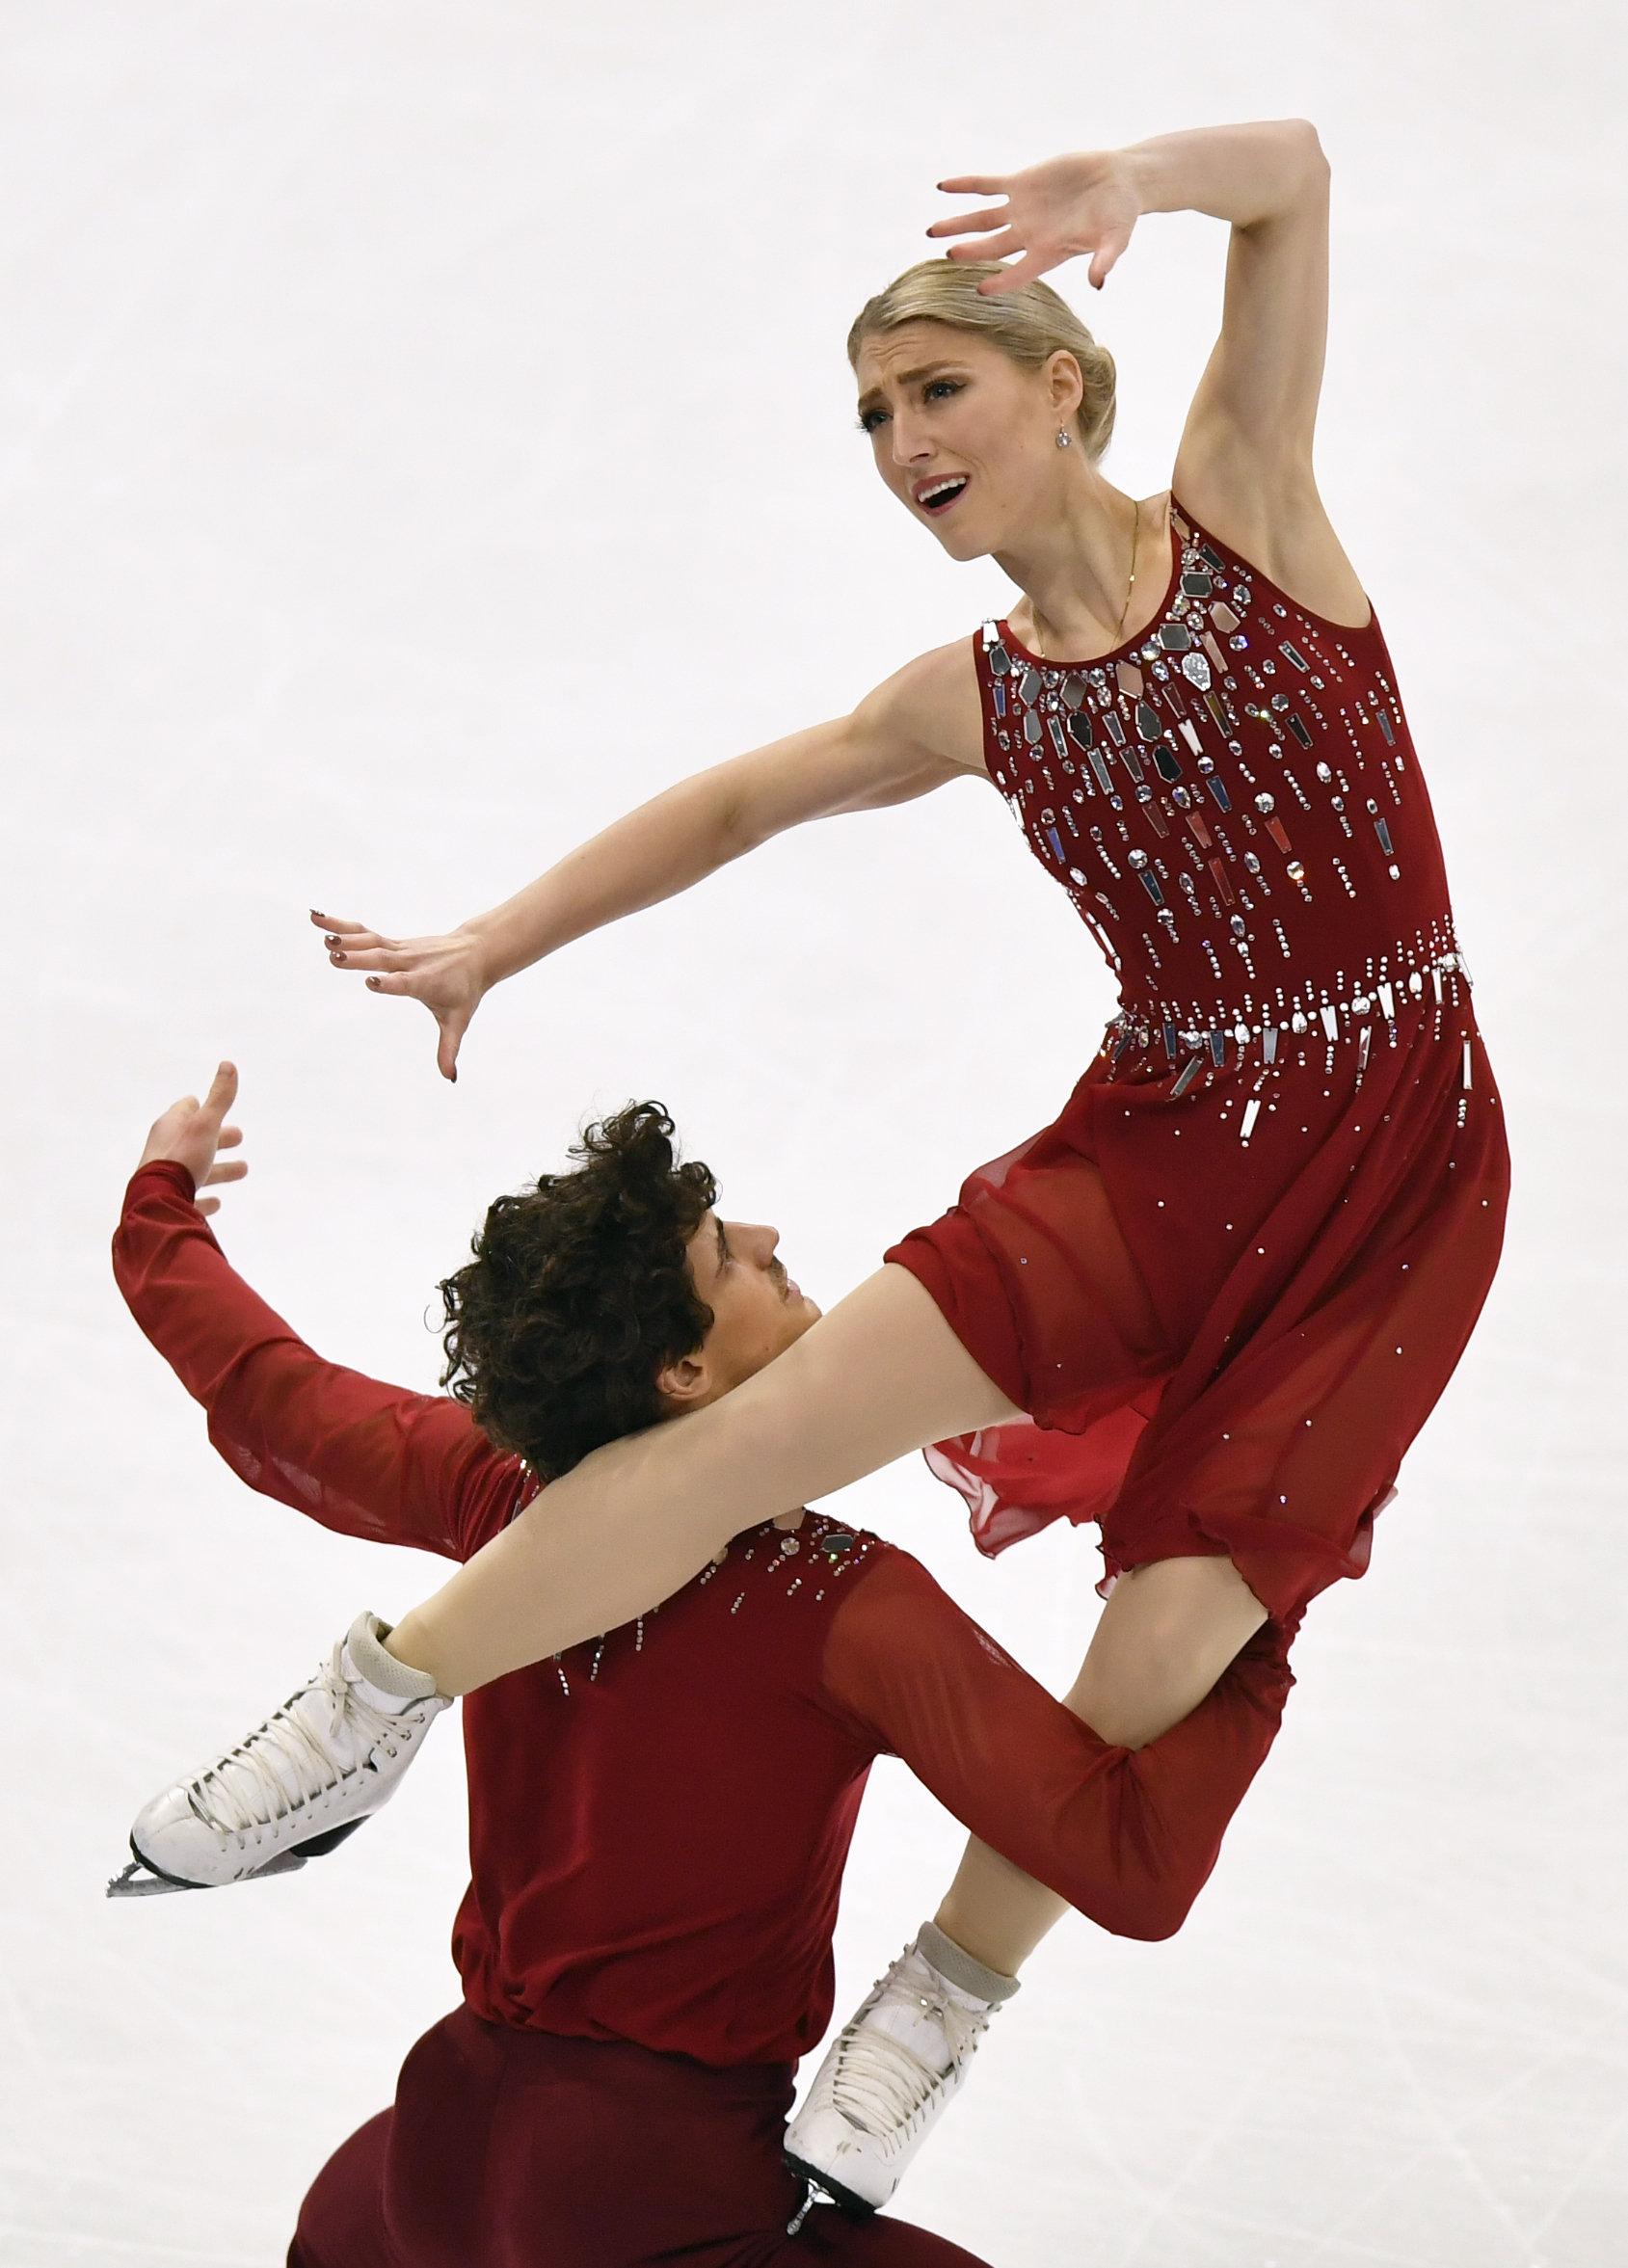 Male ice dancer lifts female partner